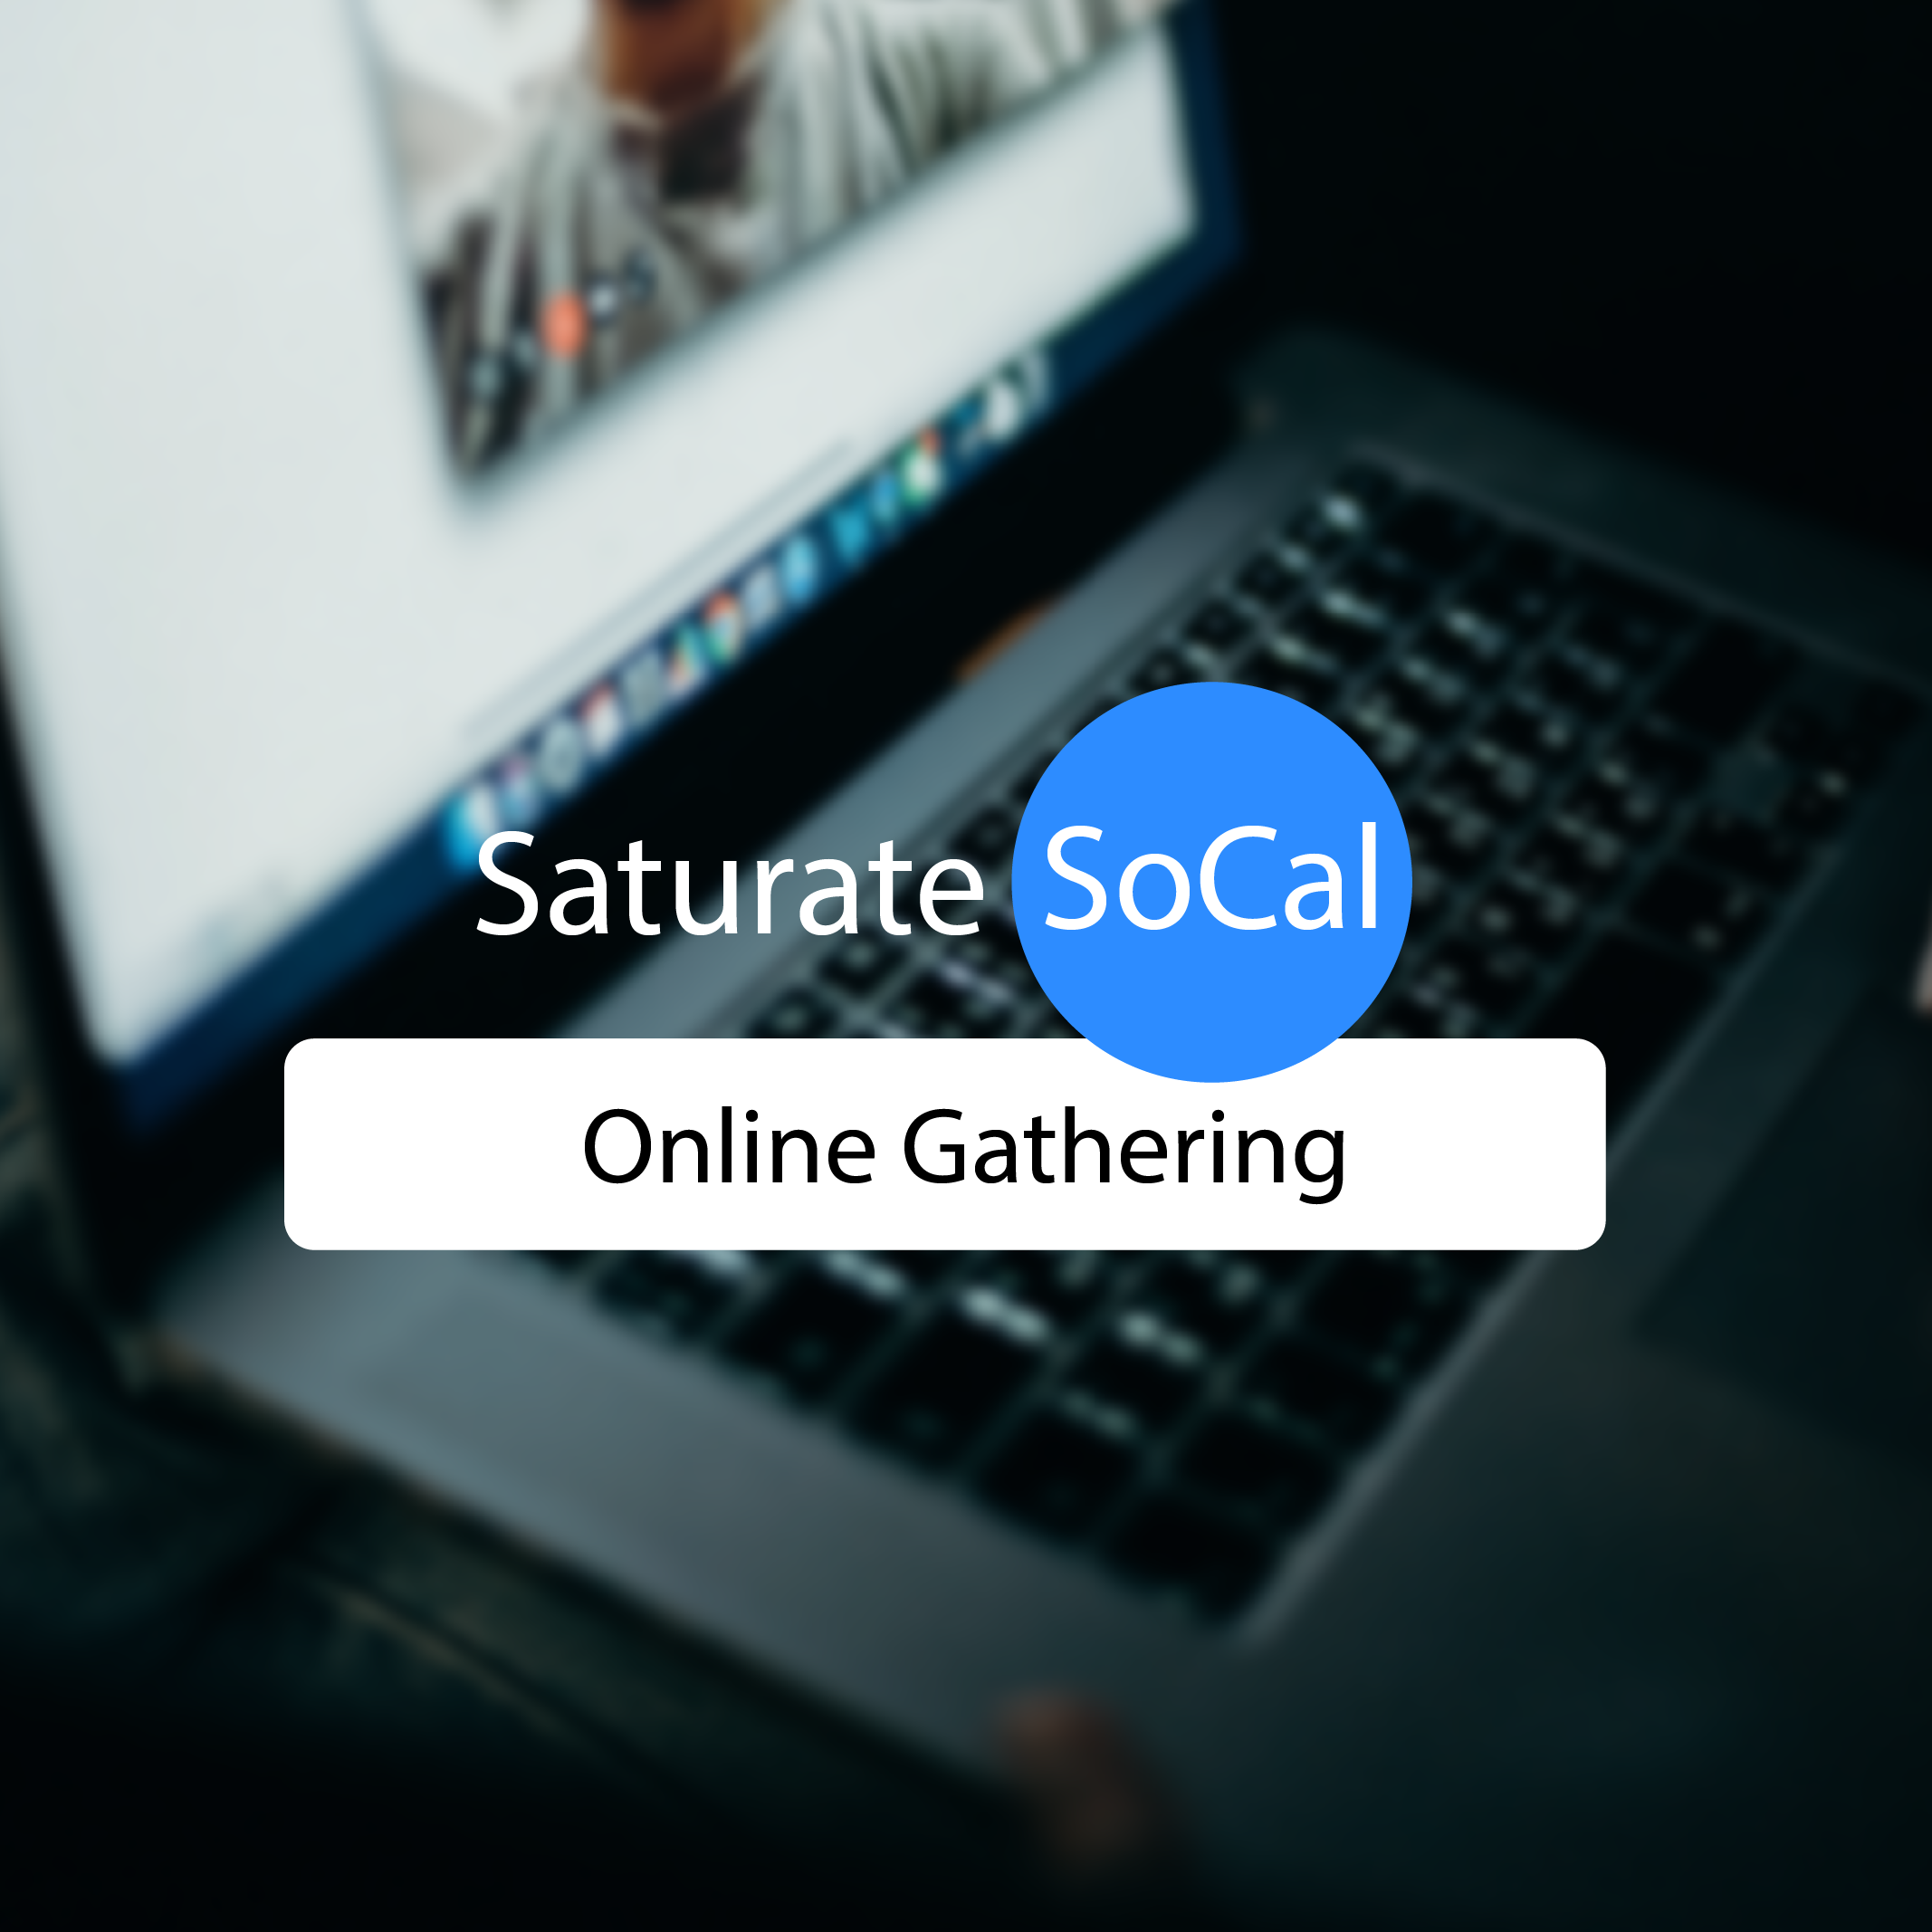 Online Gathering